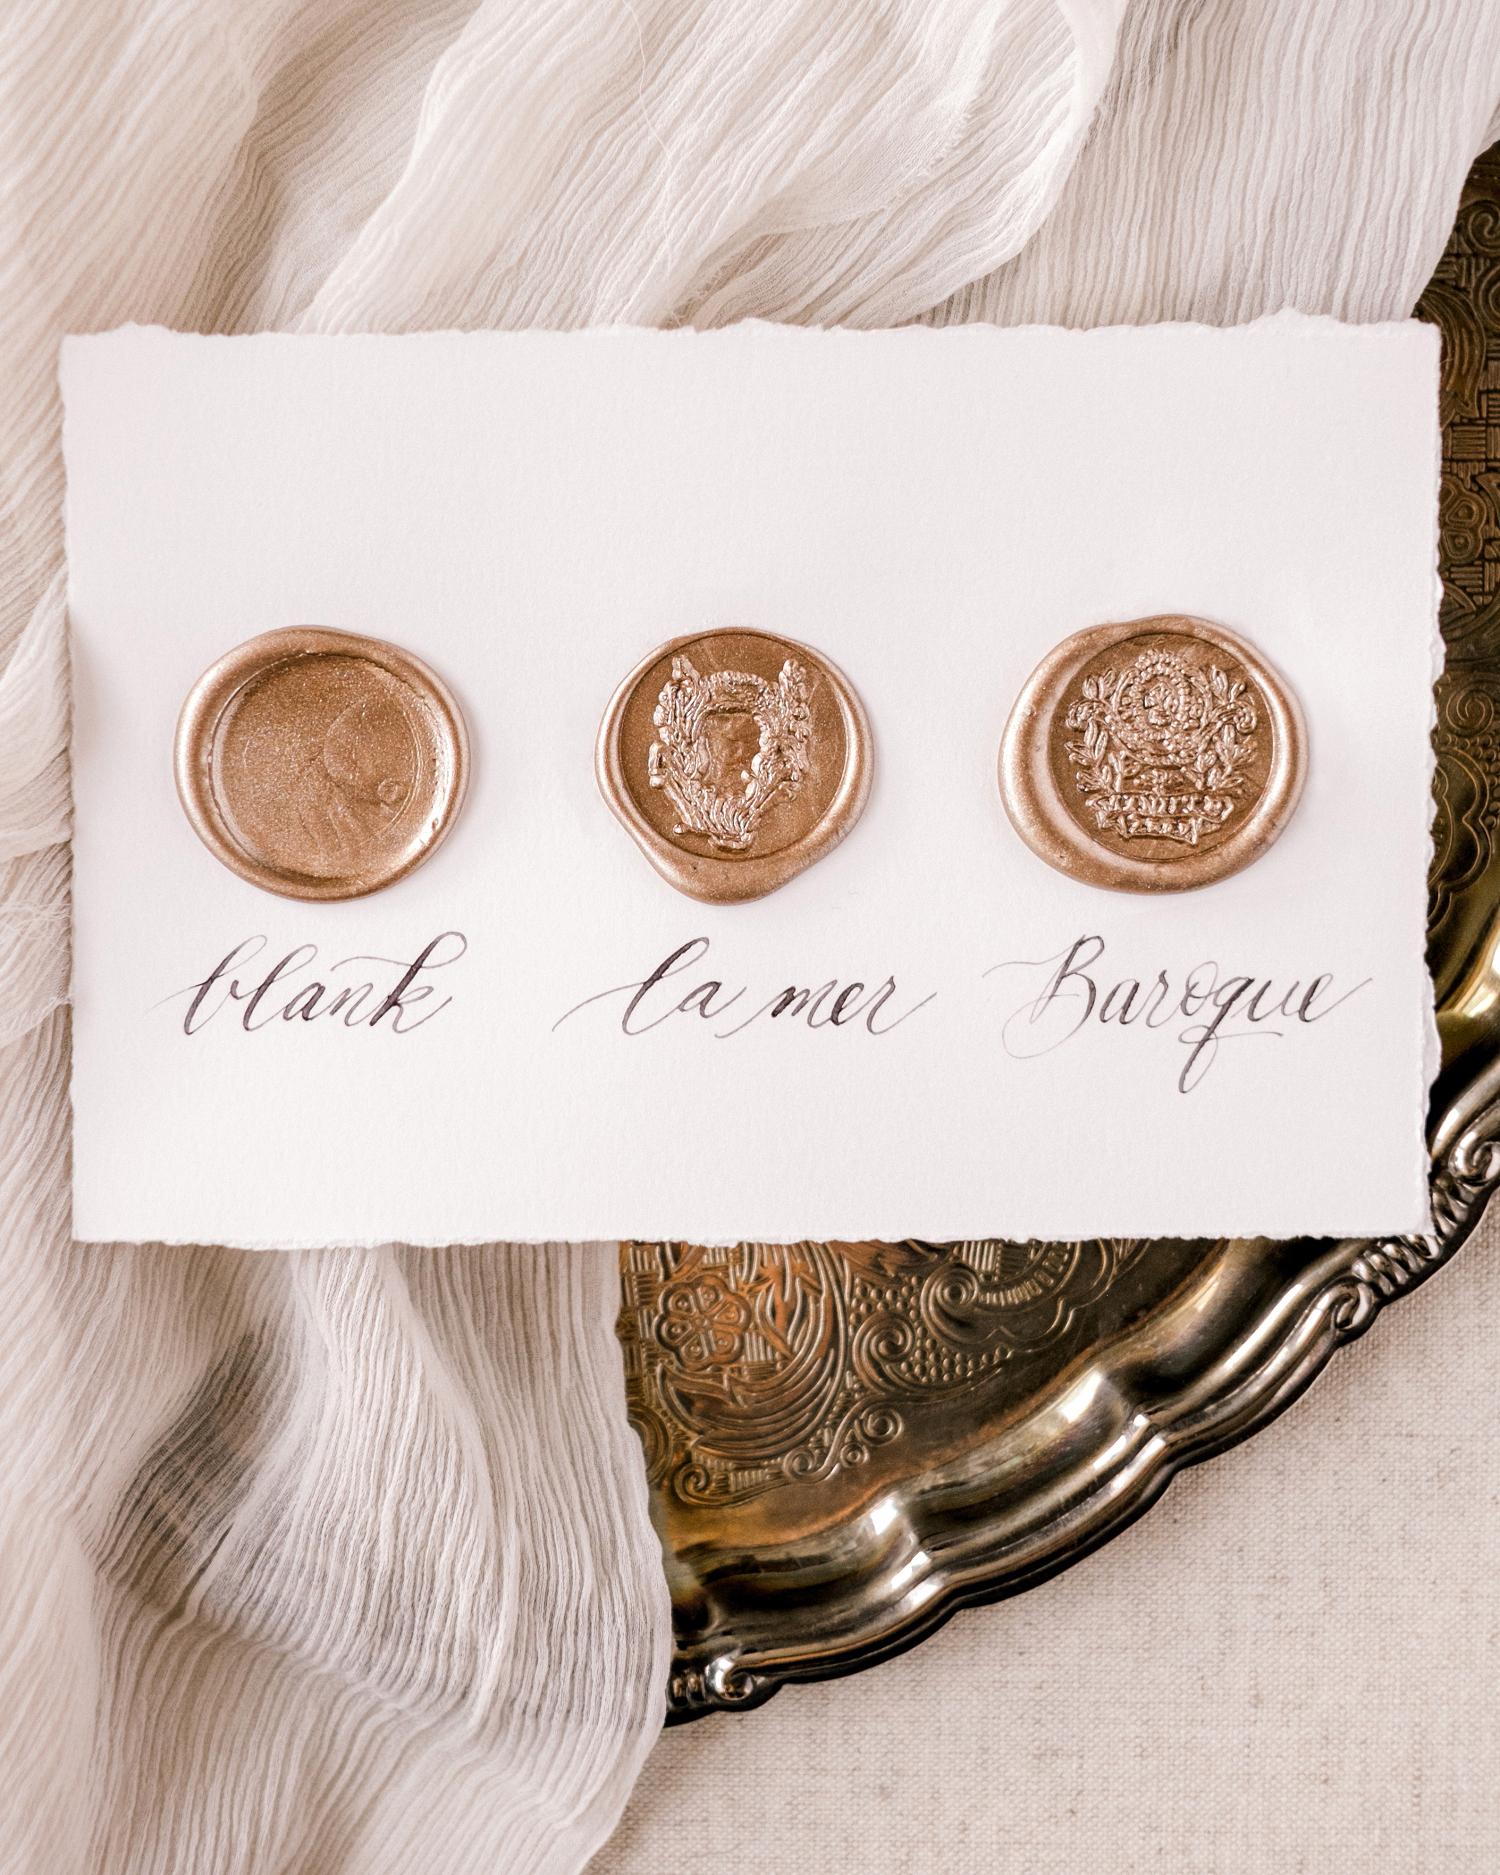 Debbie Wong Design wax seals 4.jpg